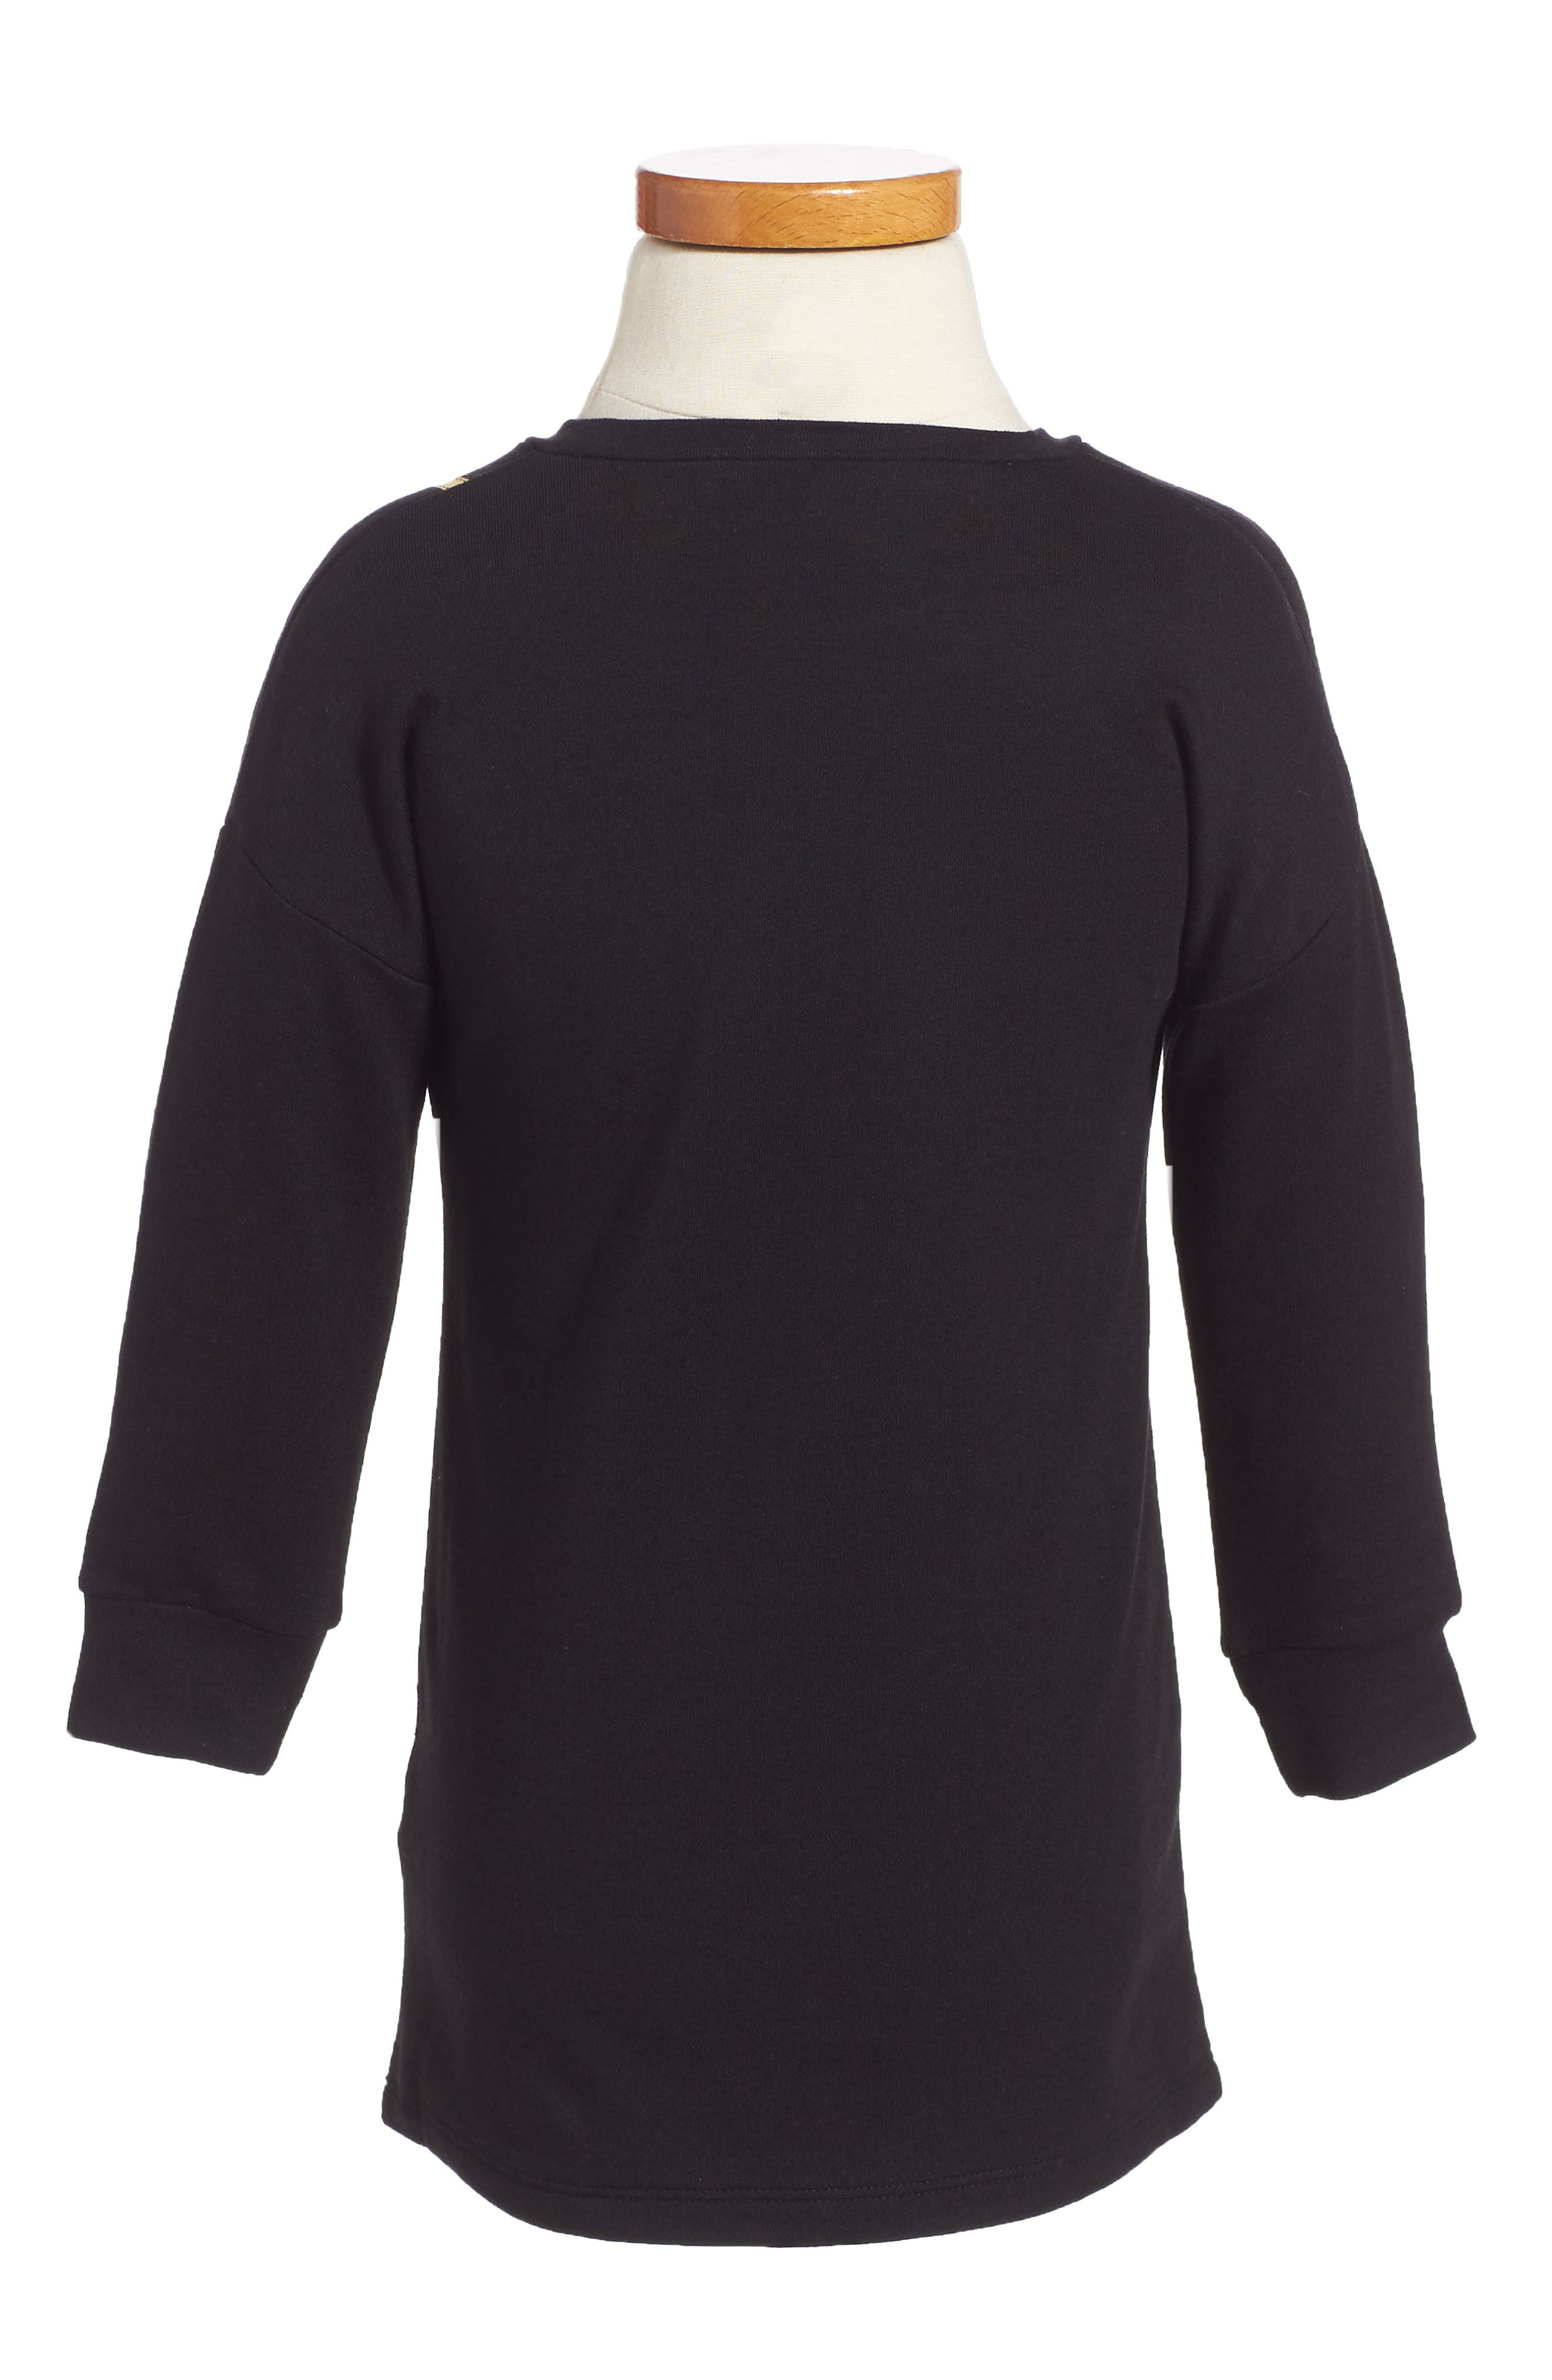 Trompe L'Oeil Sweatshirt Dress,                             Alternate thumbnail 2, color,                             Black